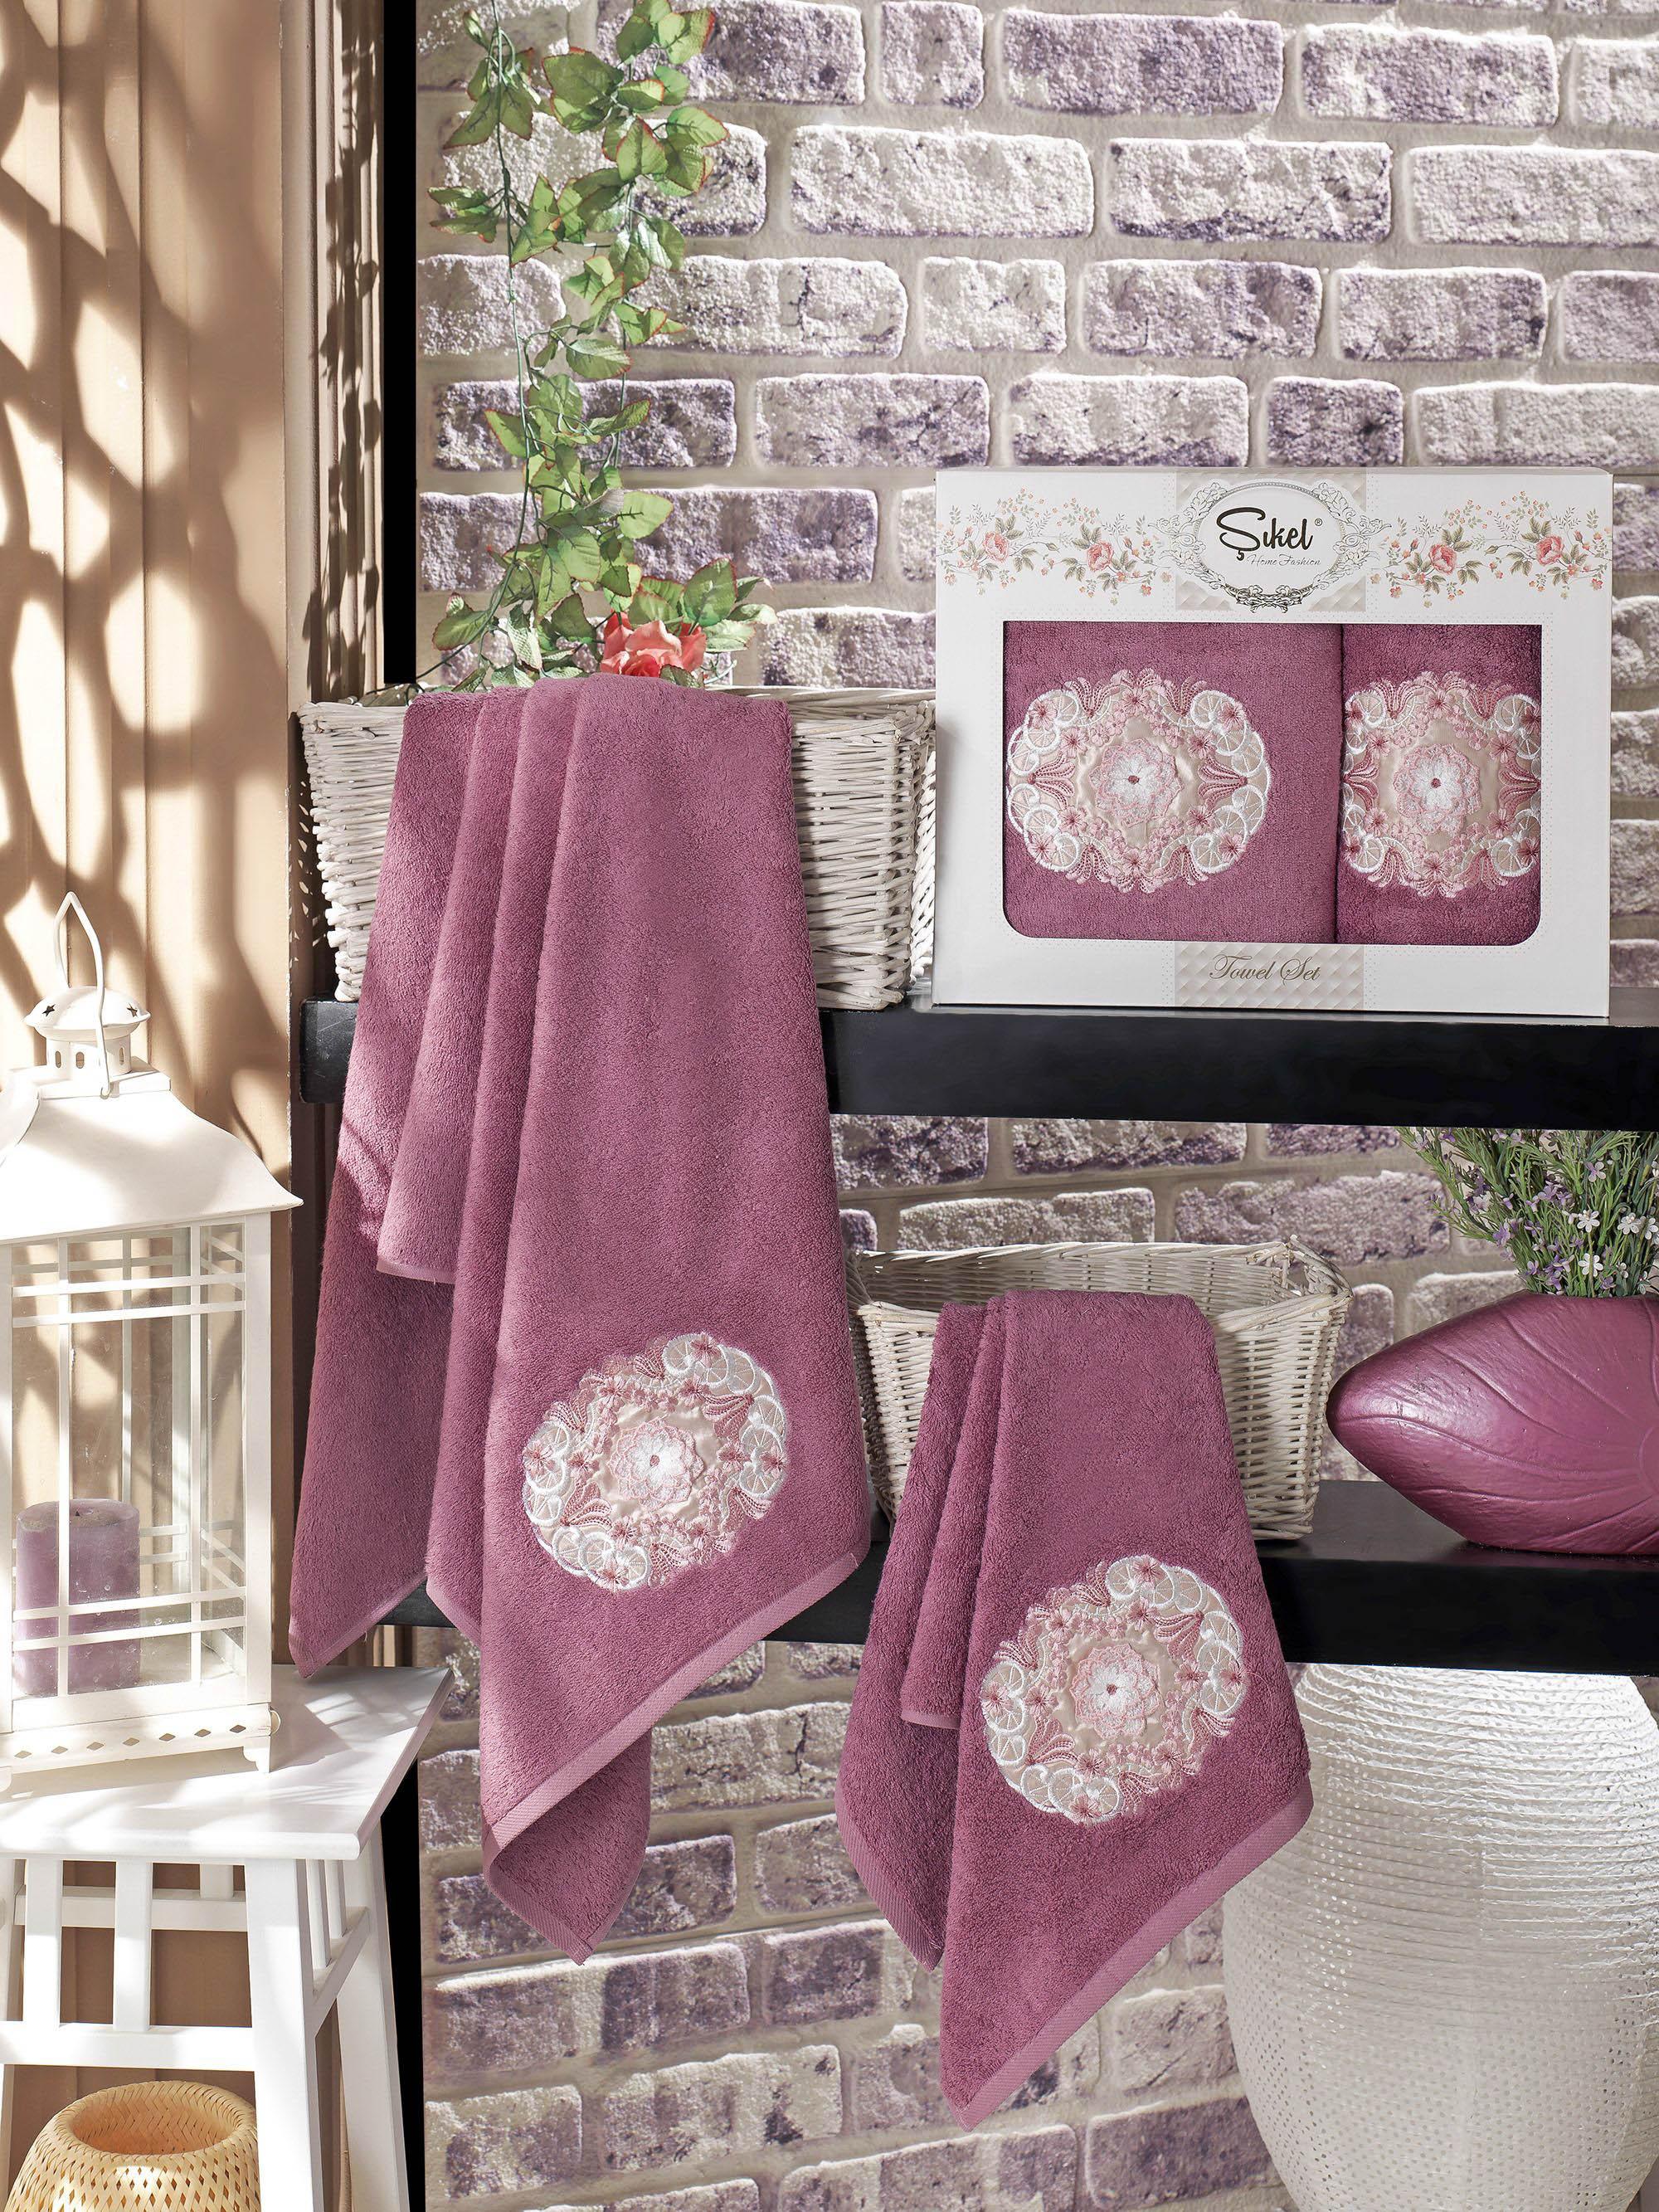 Полотенца Sikel Набор из 2 полотенец Kamelya Цвет: Фиолетовый набор из 3 полотенец merzuka sakura 50х90 2 70х140 8432 терракотовый